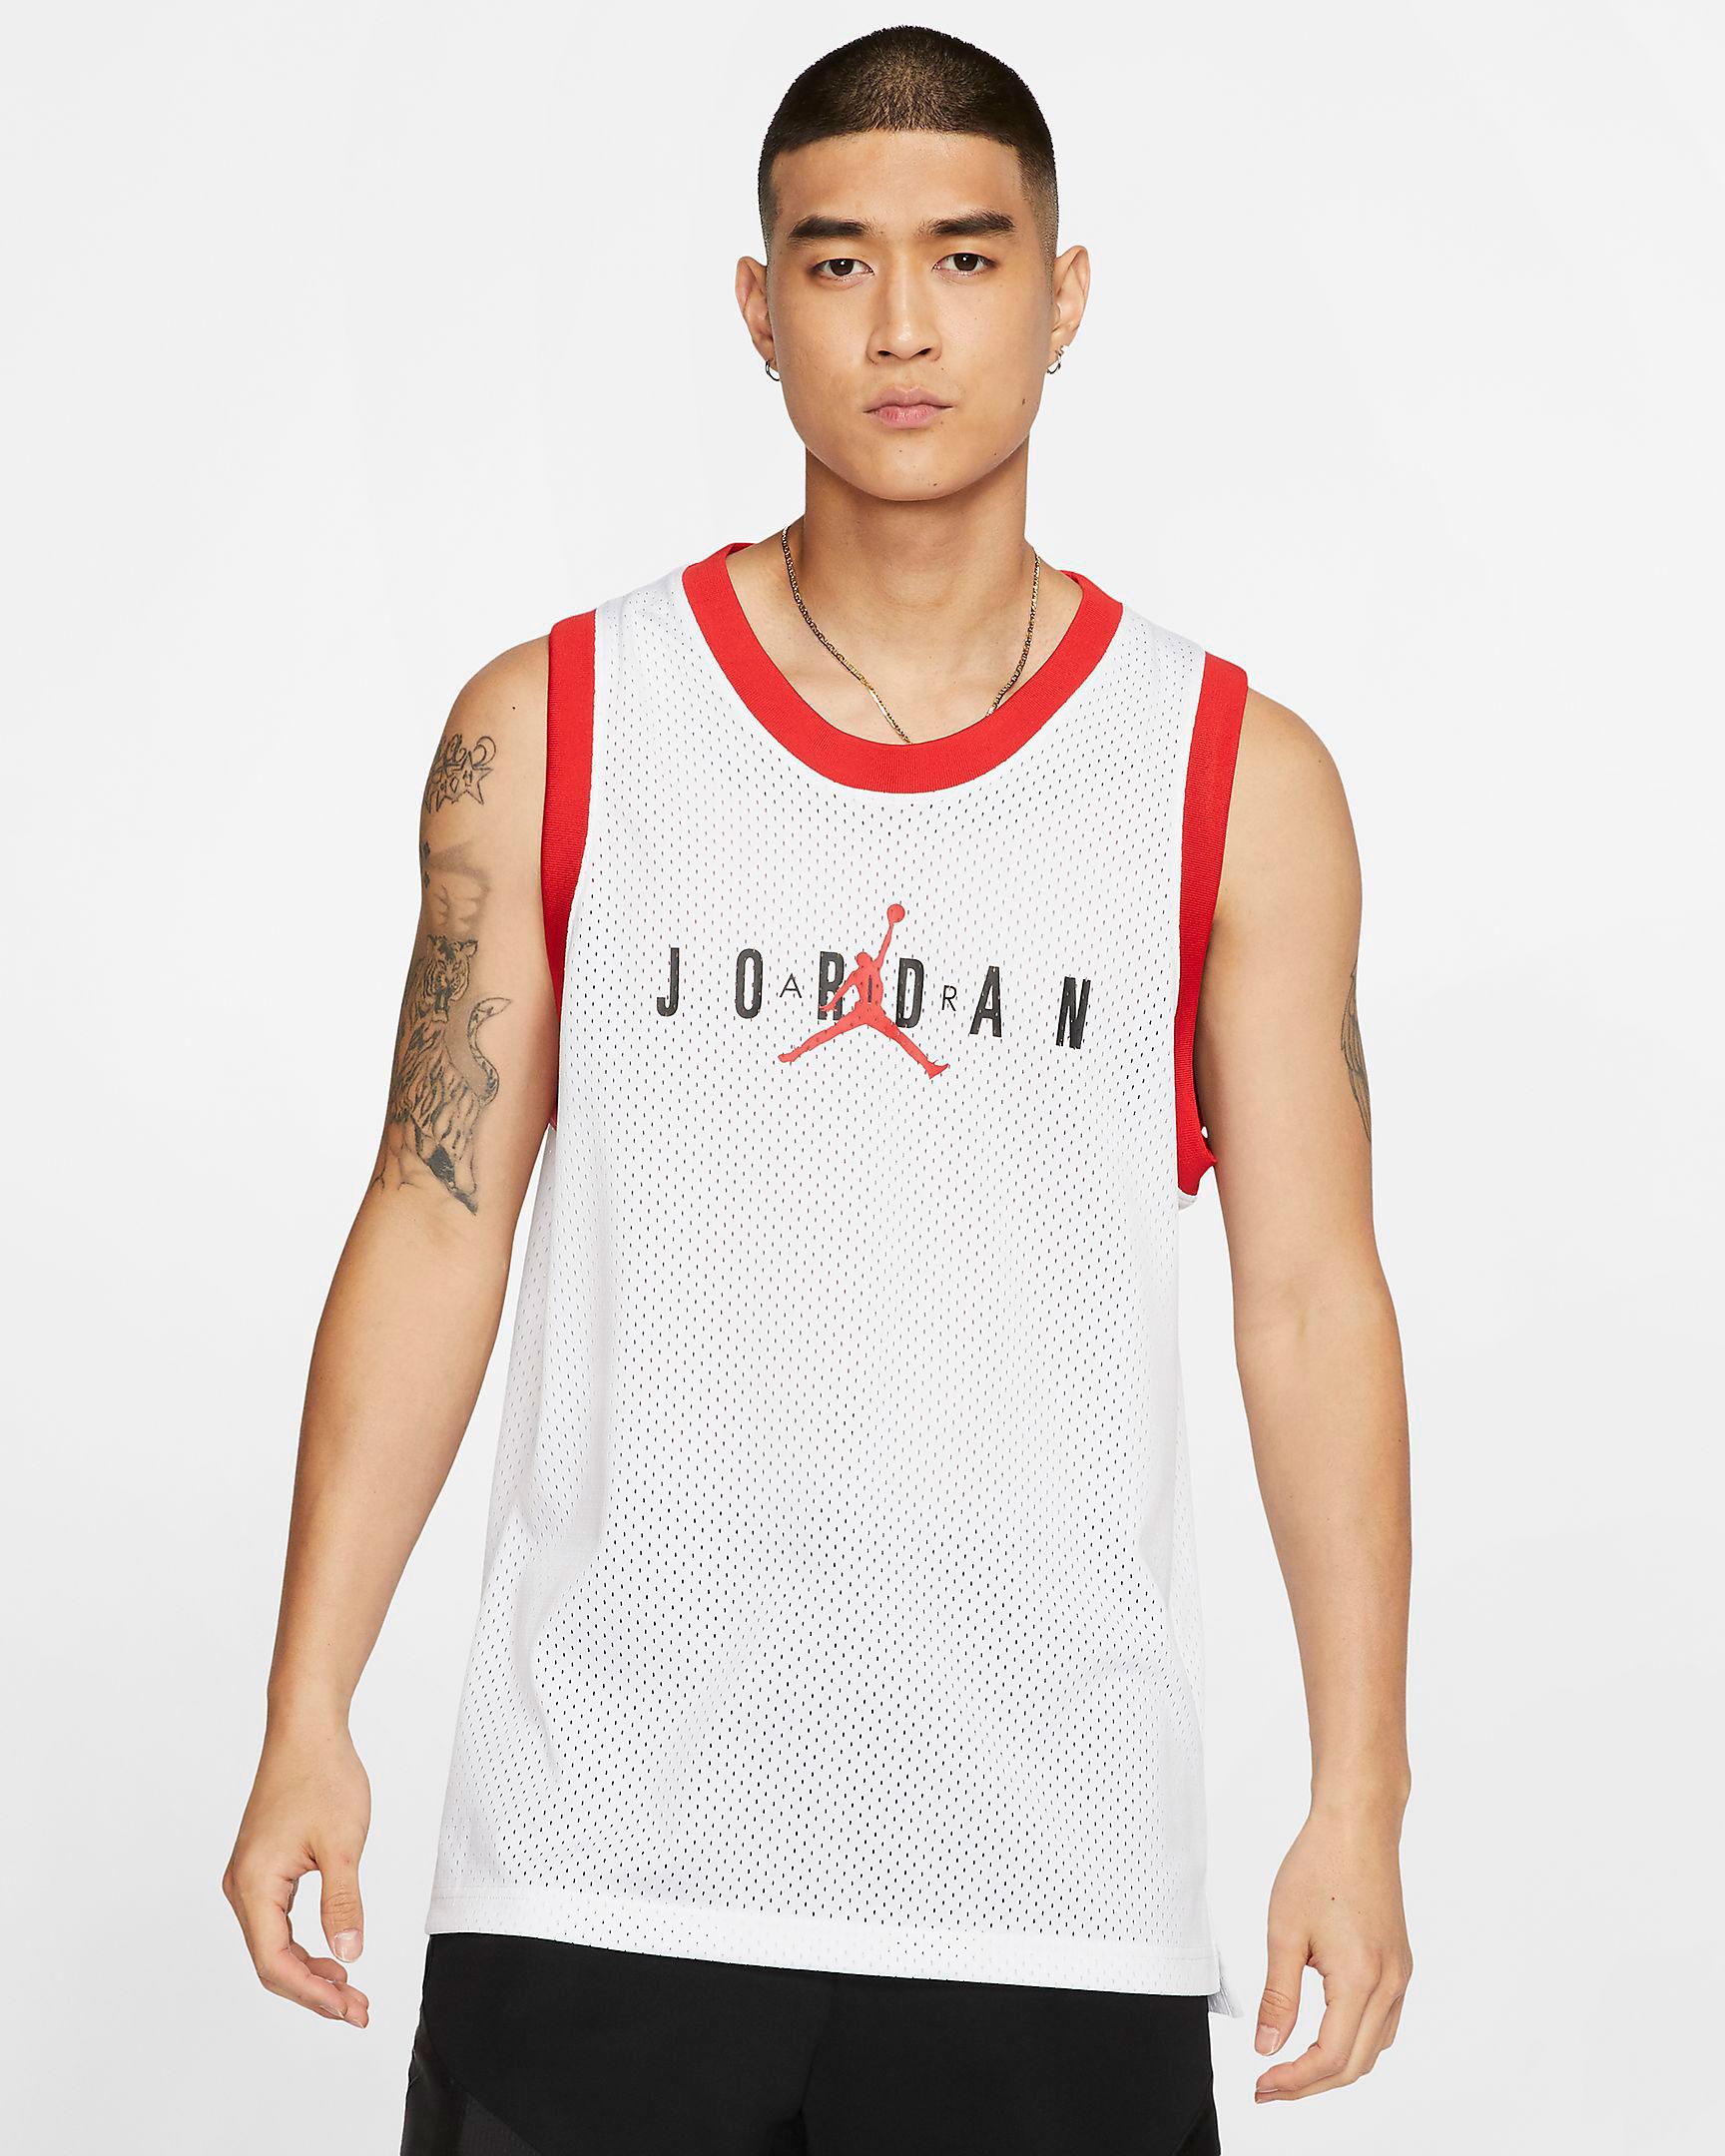 jordan-6-hare-jersey-tank-top-match-white-red